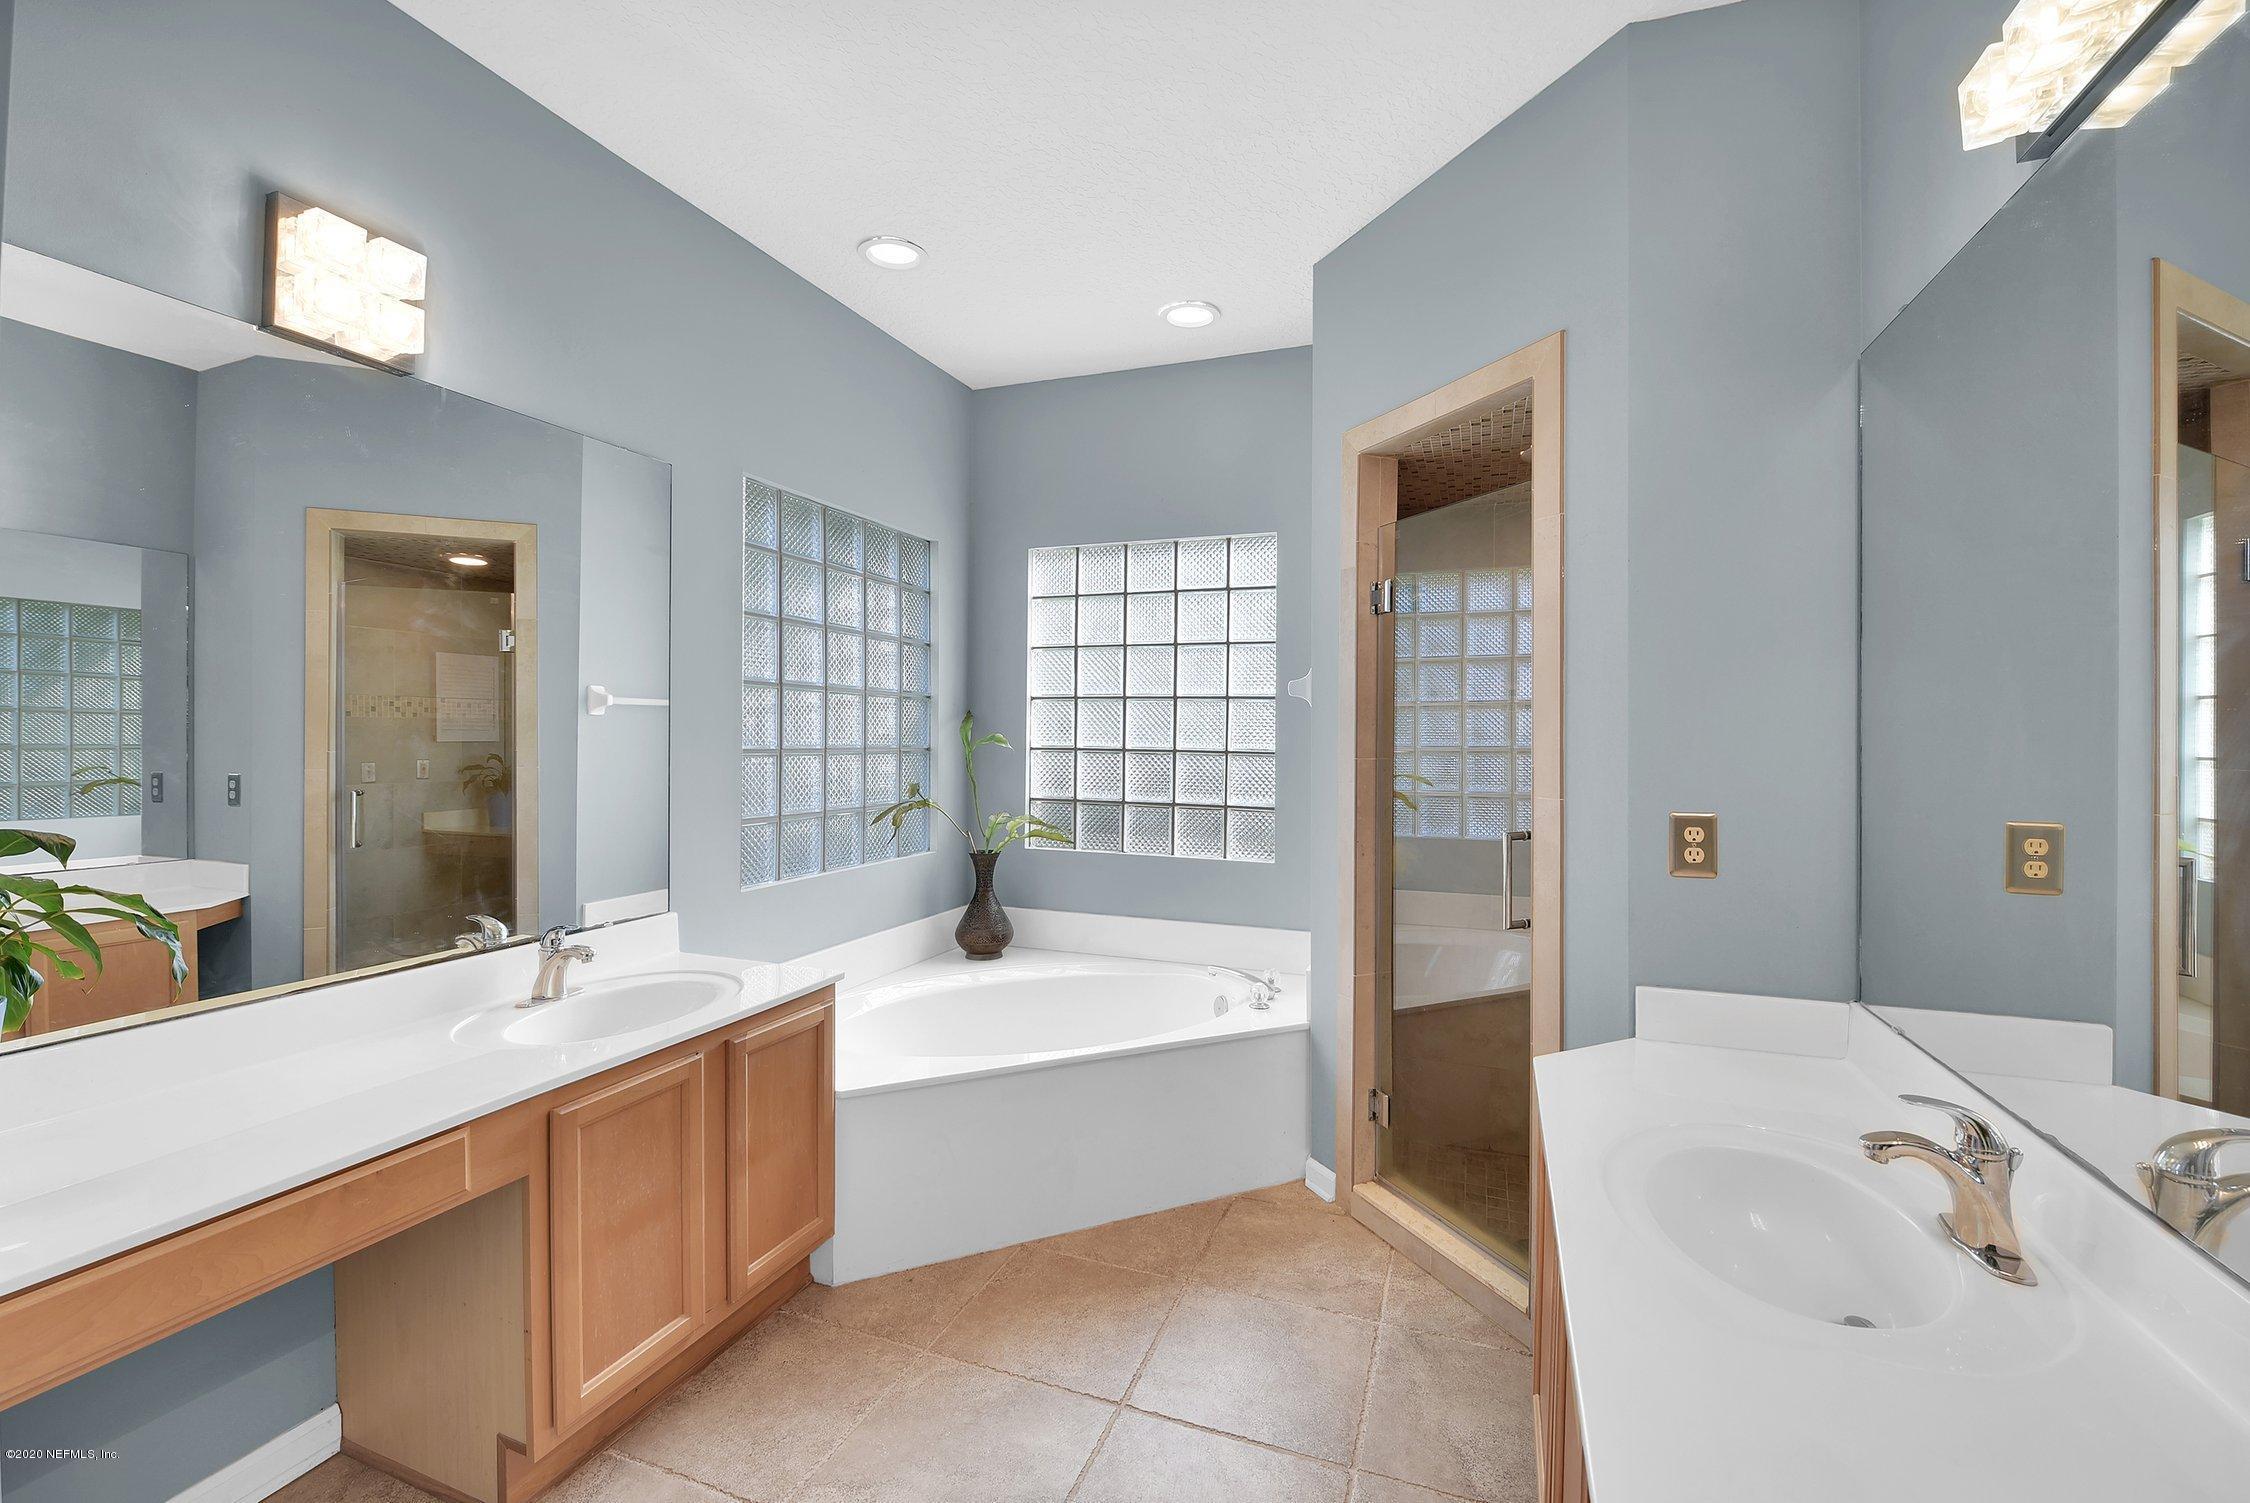 2385 PINE ISLAND, JACKSONVILLE, FLORIDA 32224, 4 Bedrooms Bedrooms, ,3 BathroomsBathrooms,Residential,For sale,PINE ISLAND,1081980